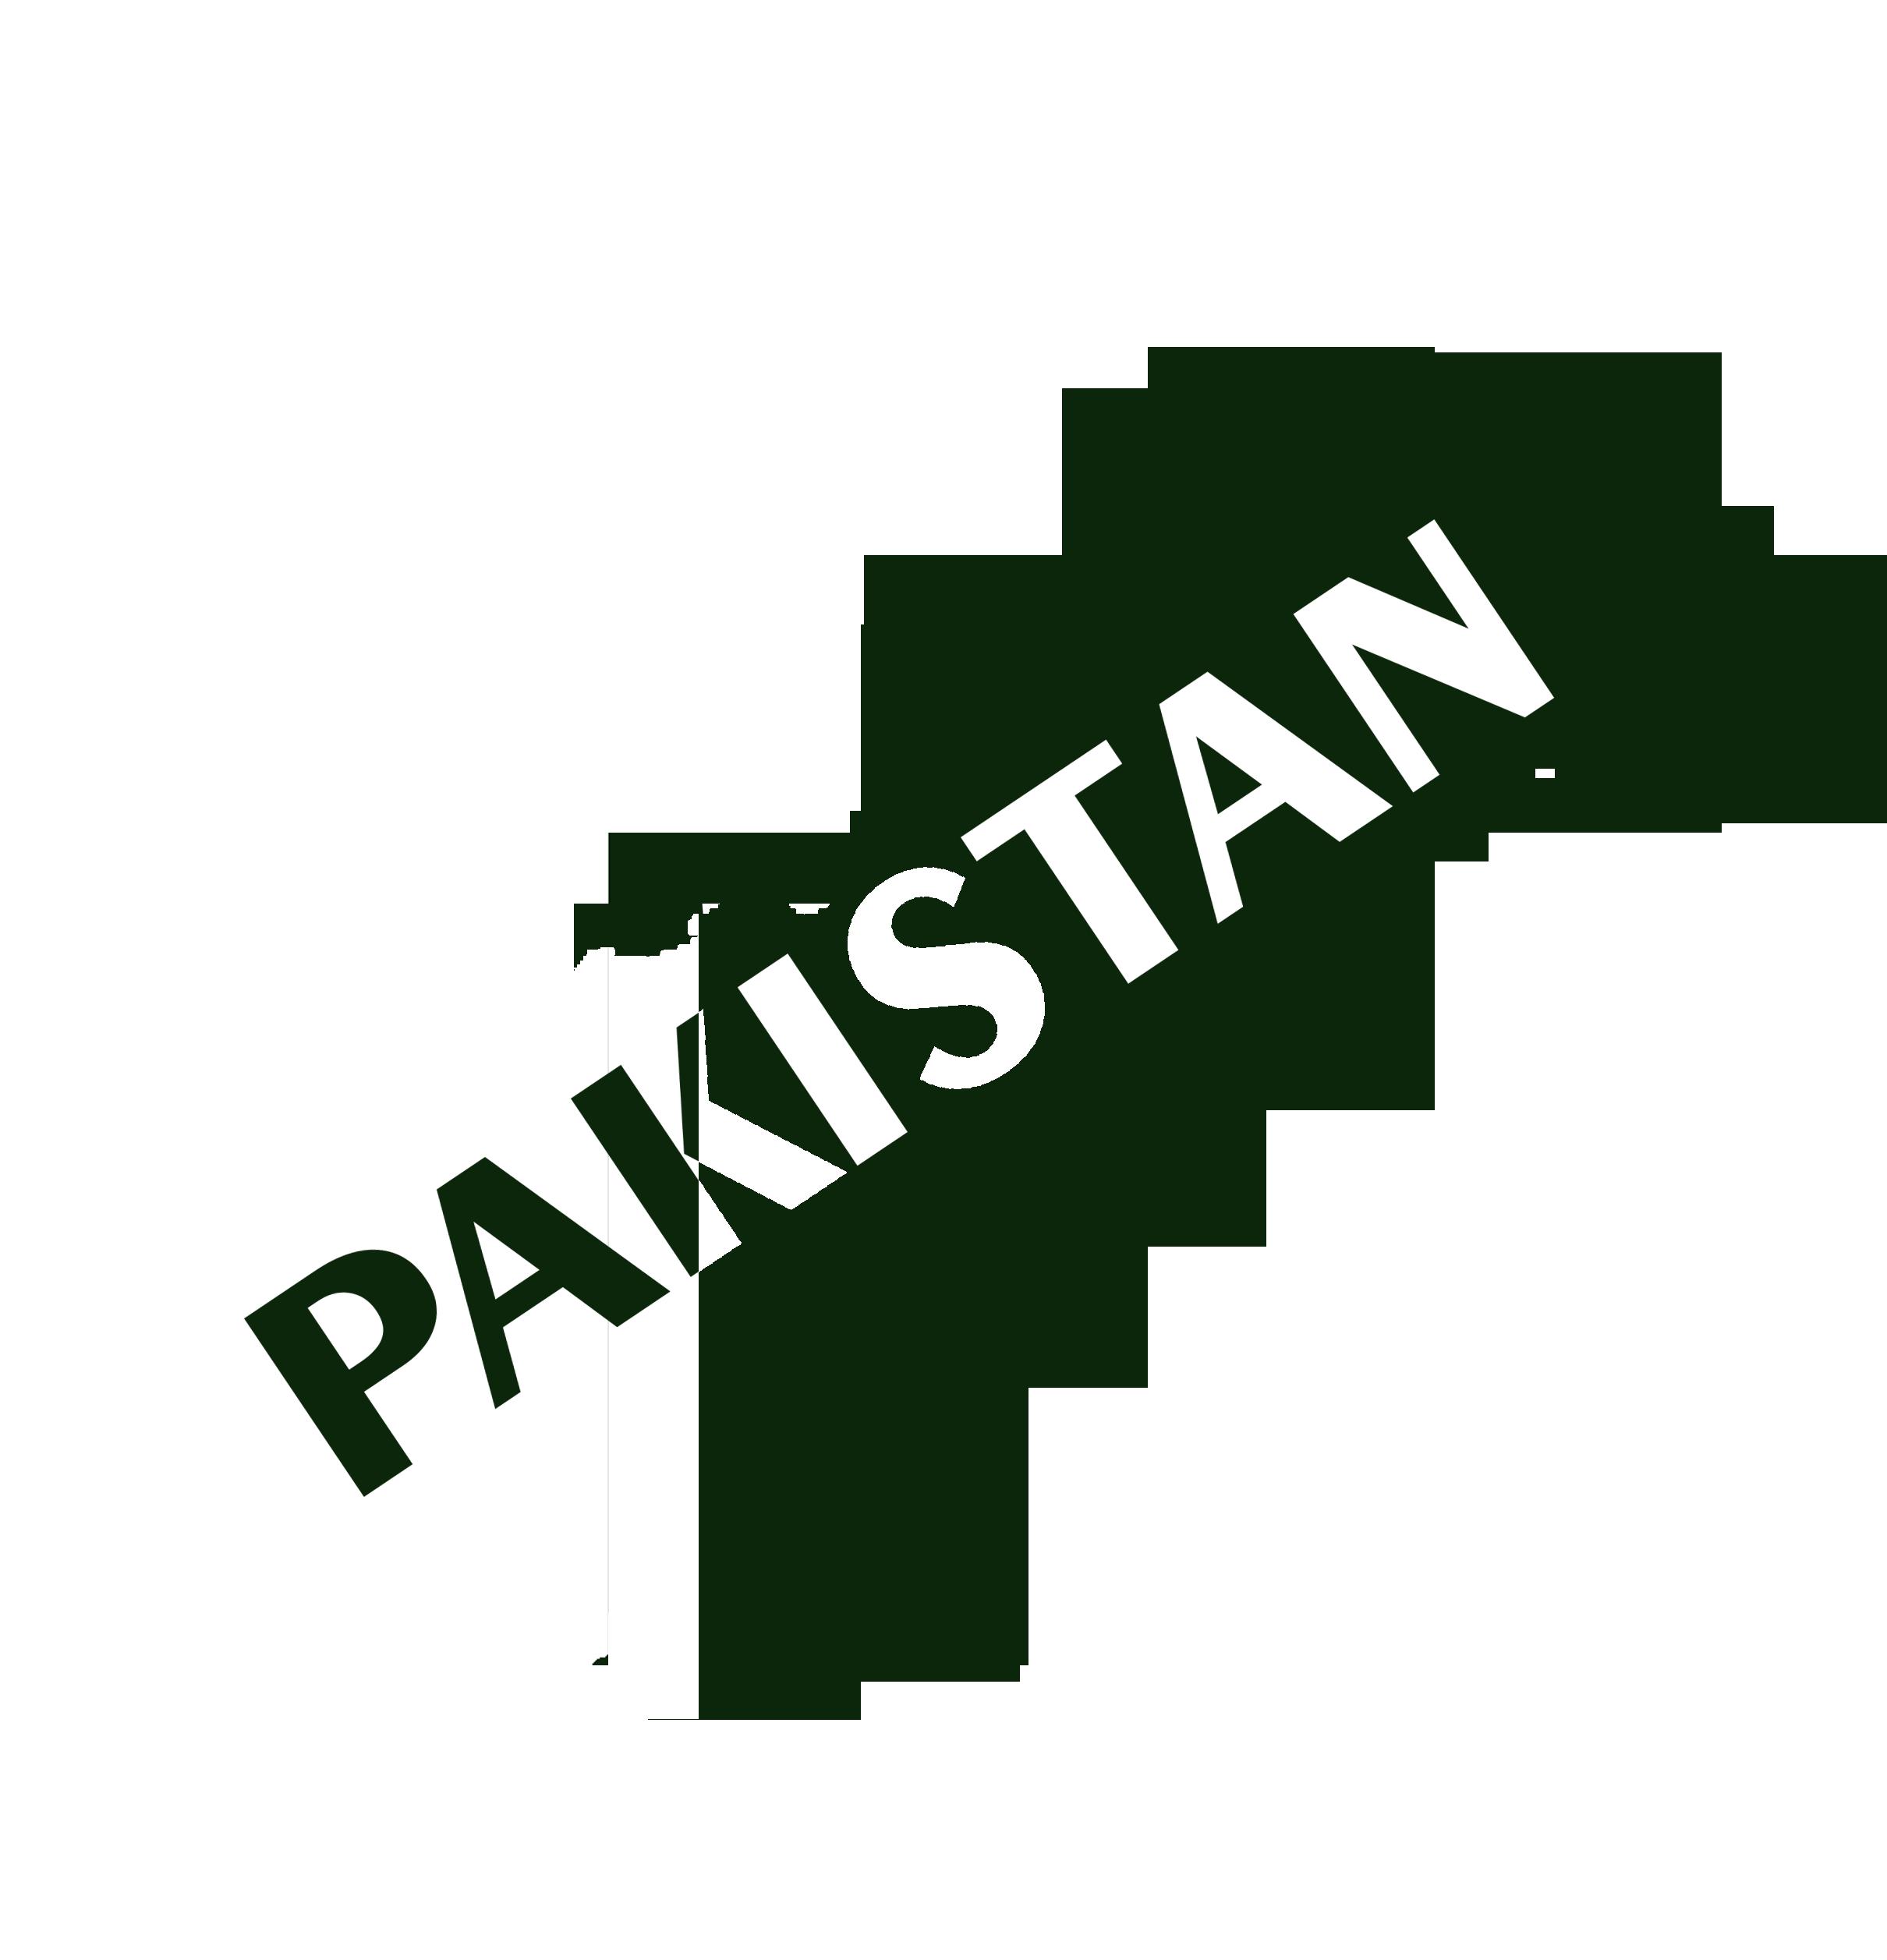 Pakistan Flag Map Pakistan Map Pakistan Flag (With